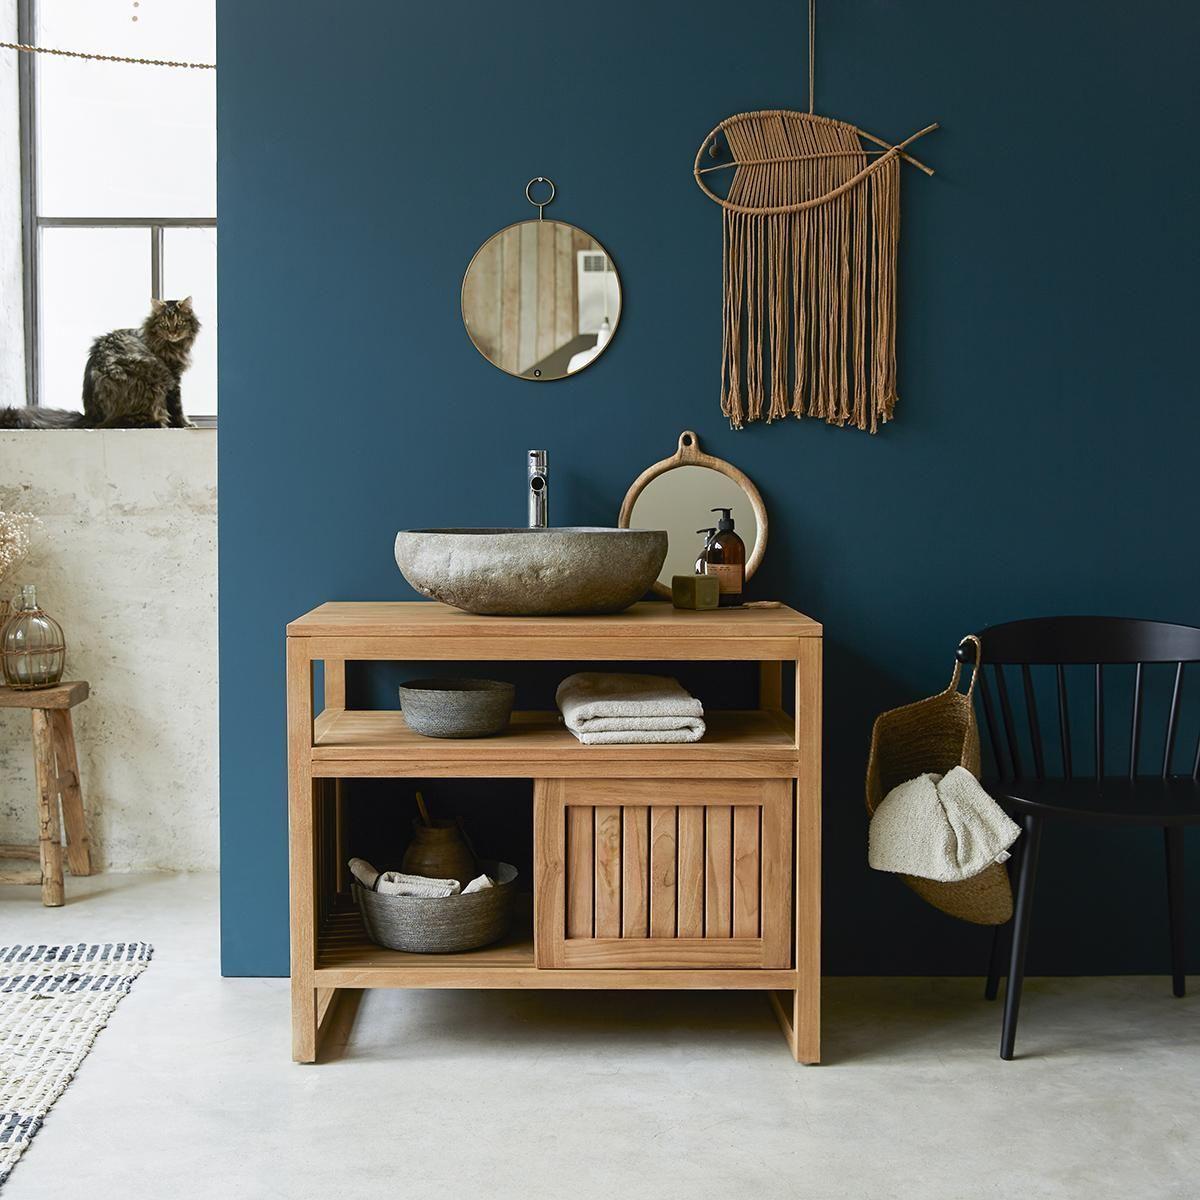 Solid Teak Wood Vanity Cabinet Wash Stand Modern Design Bathroom Furniture In 2020 With Images Bathroom Furniture Design Teak Furniture Timber Vanity